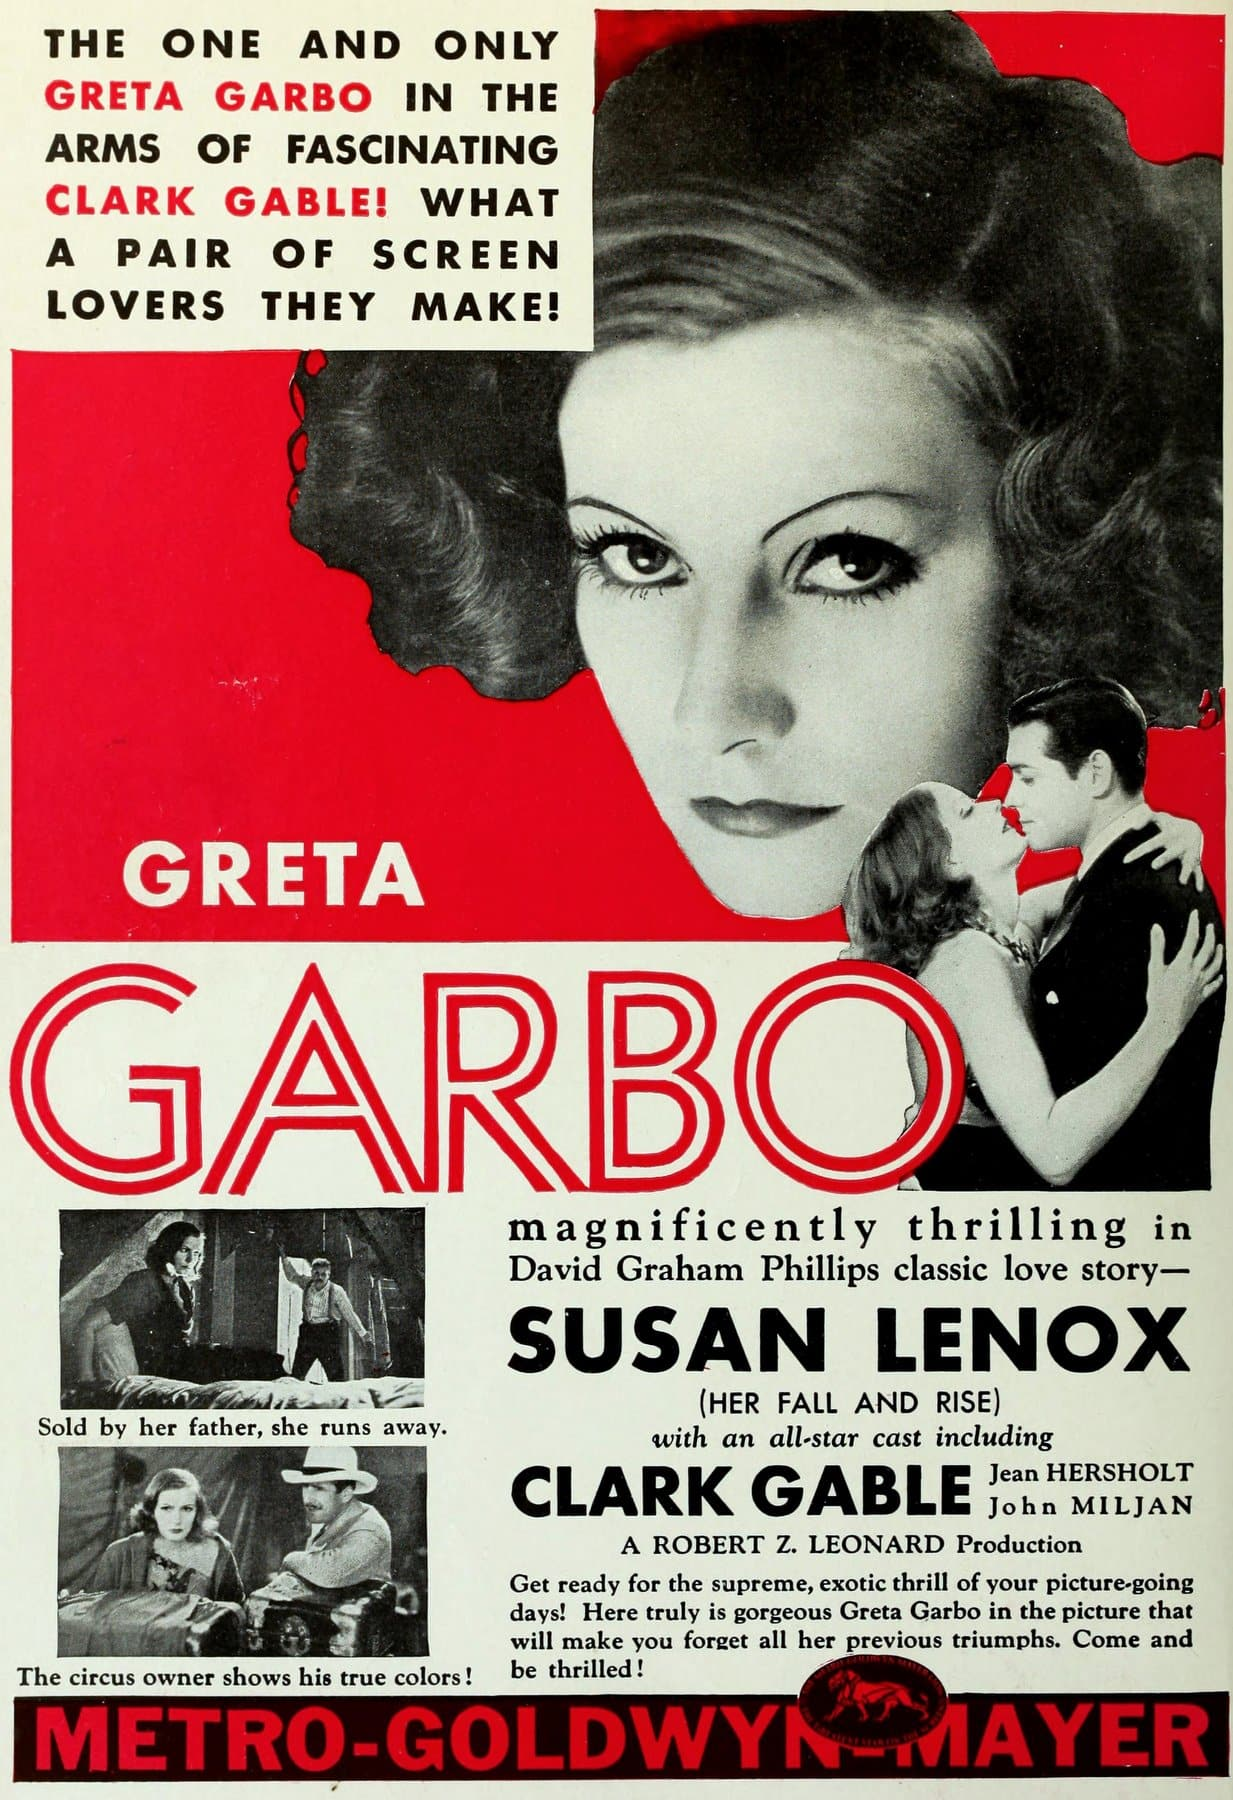 Greta Garbo in Susan Lenox (Her Fall and Rise) in 1931